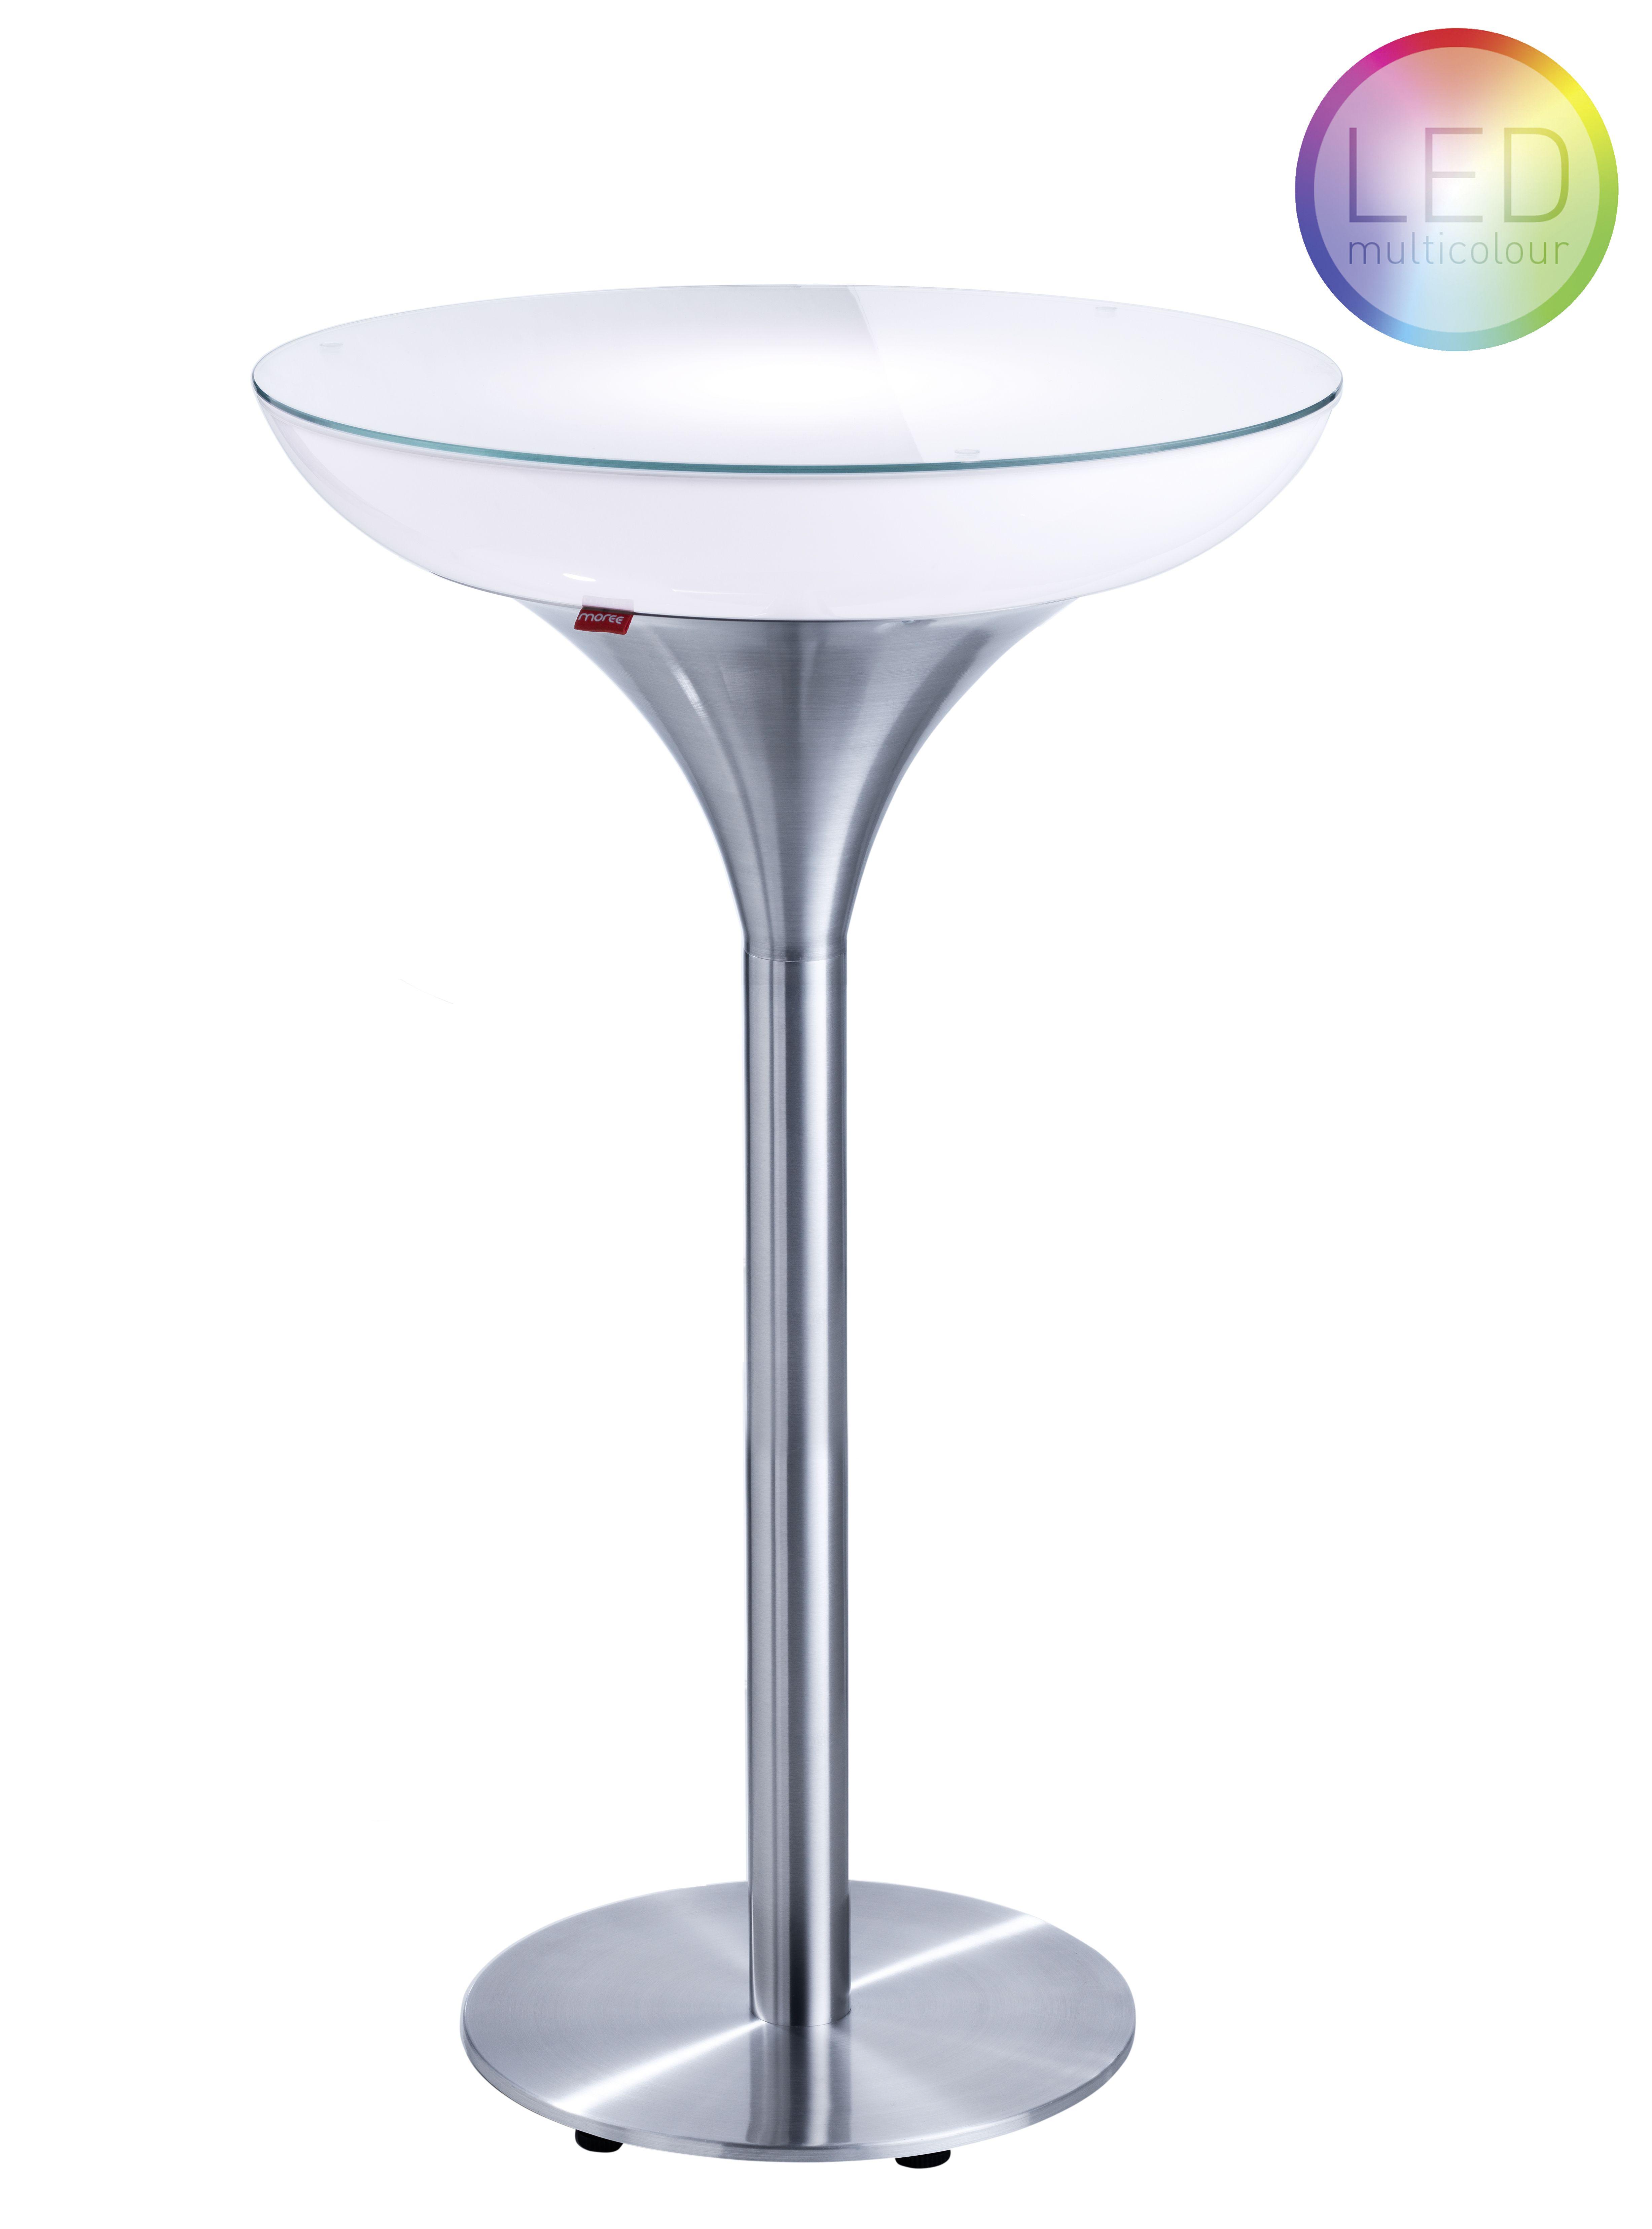 cd0bfaeac4d2495874c406a1fce17b6c Impressionnant De Table Bar Exterieur Conception